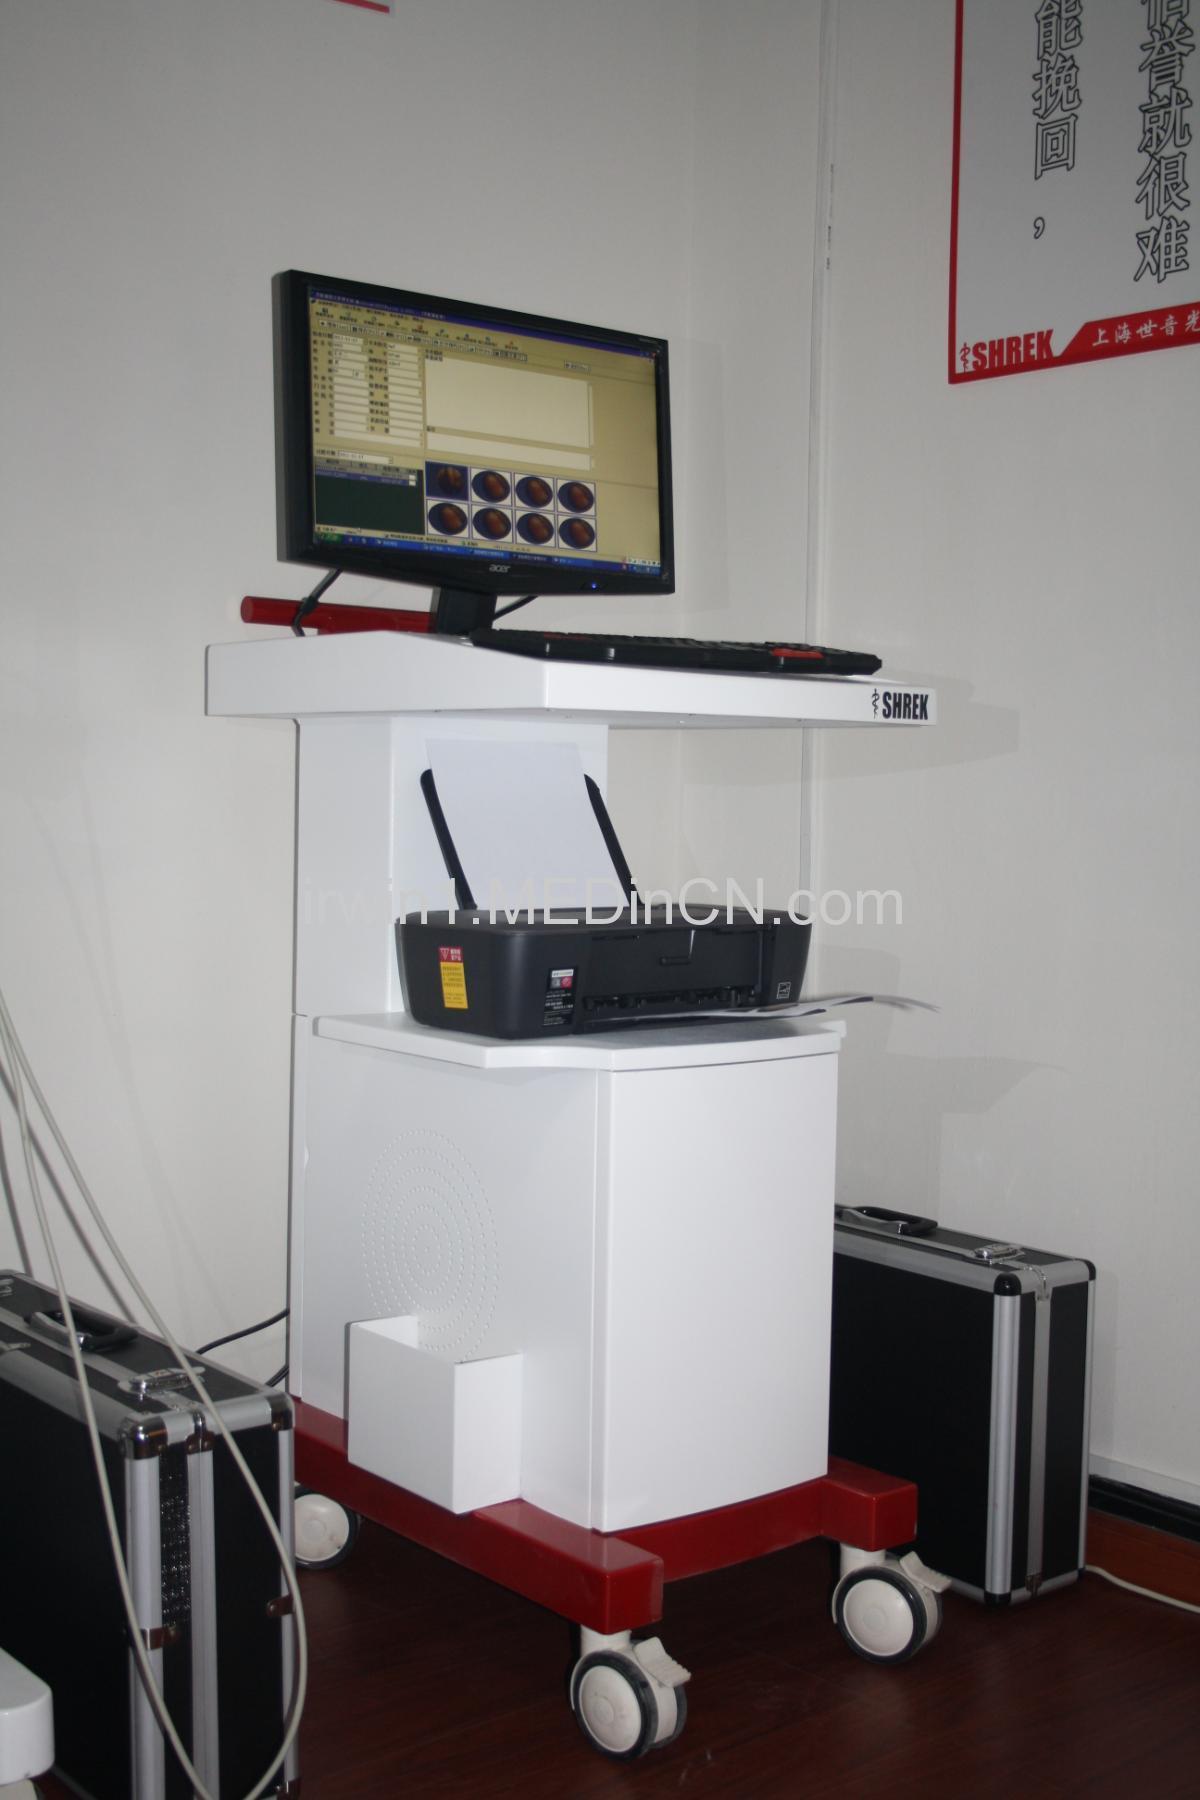 medical endoscope ccd camera system workstation software